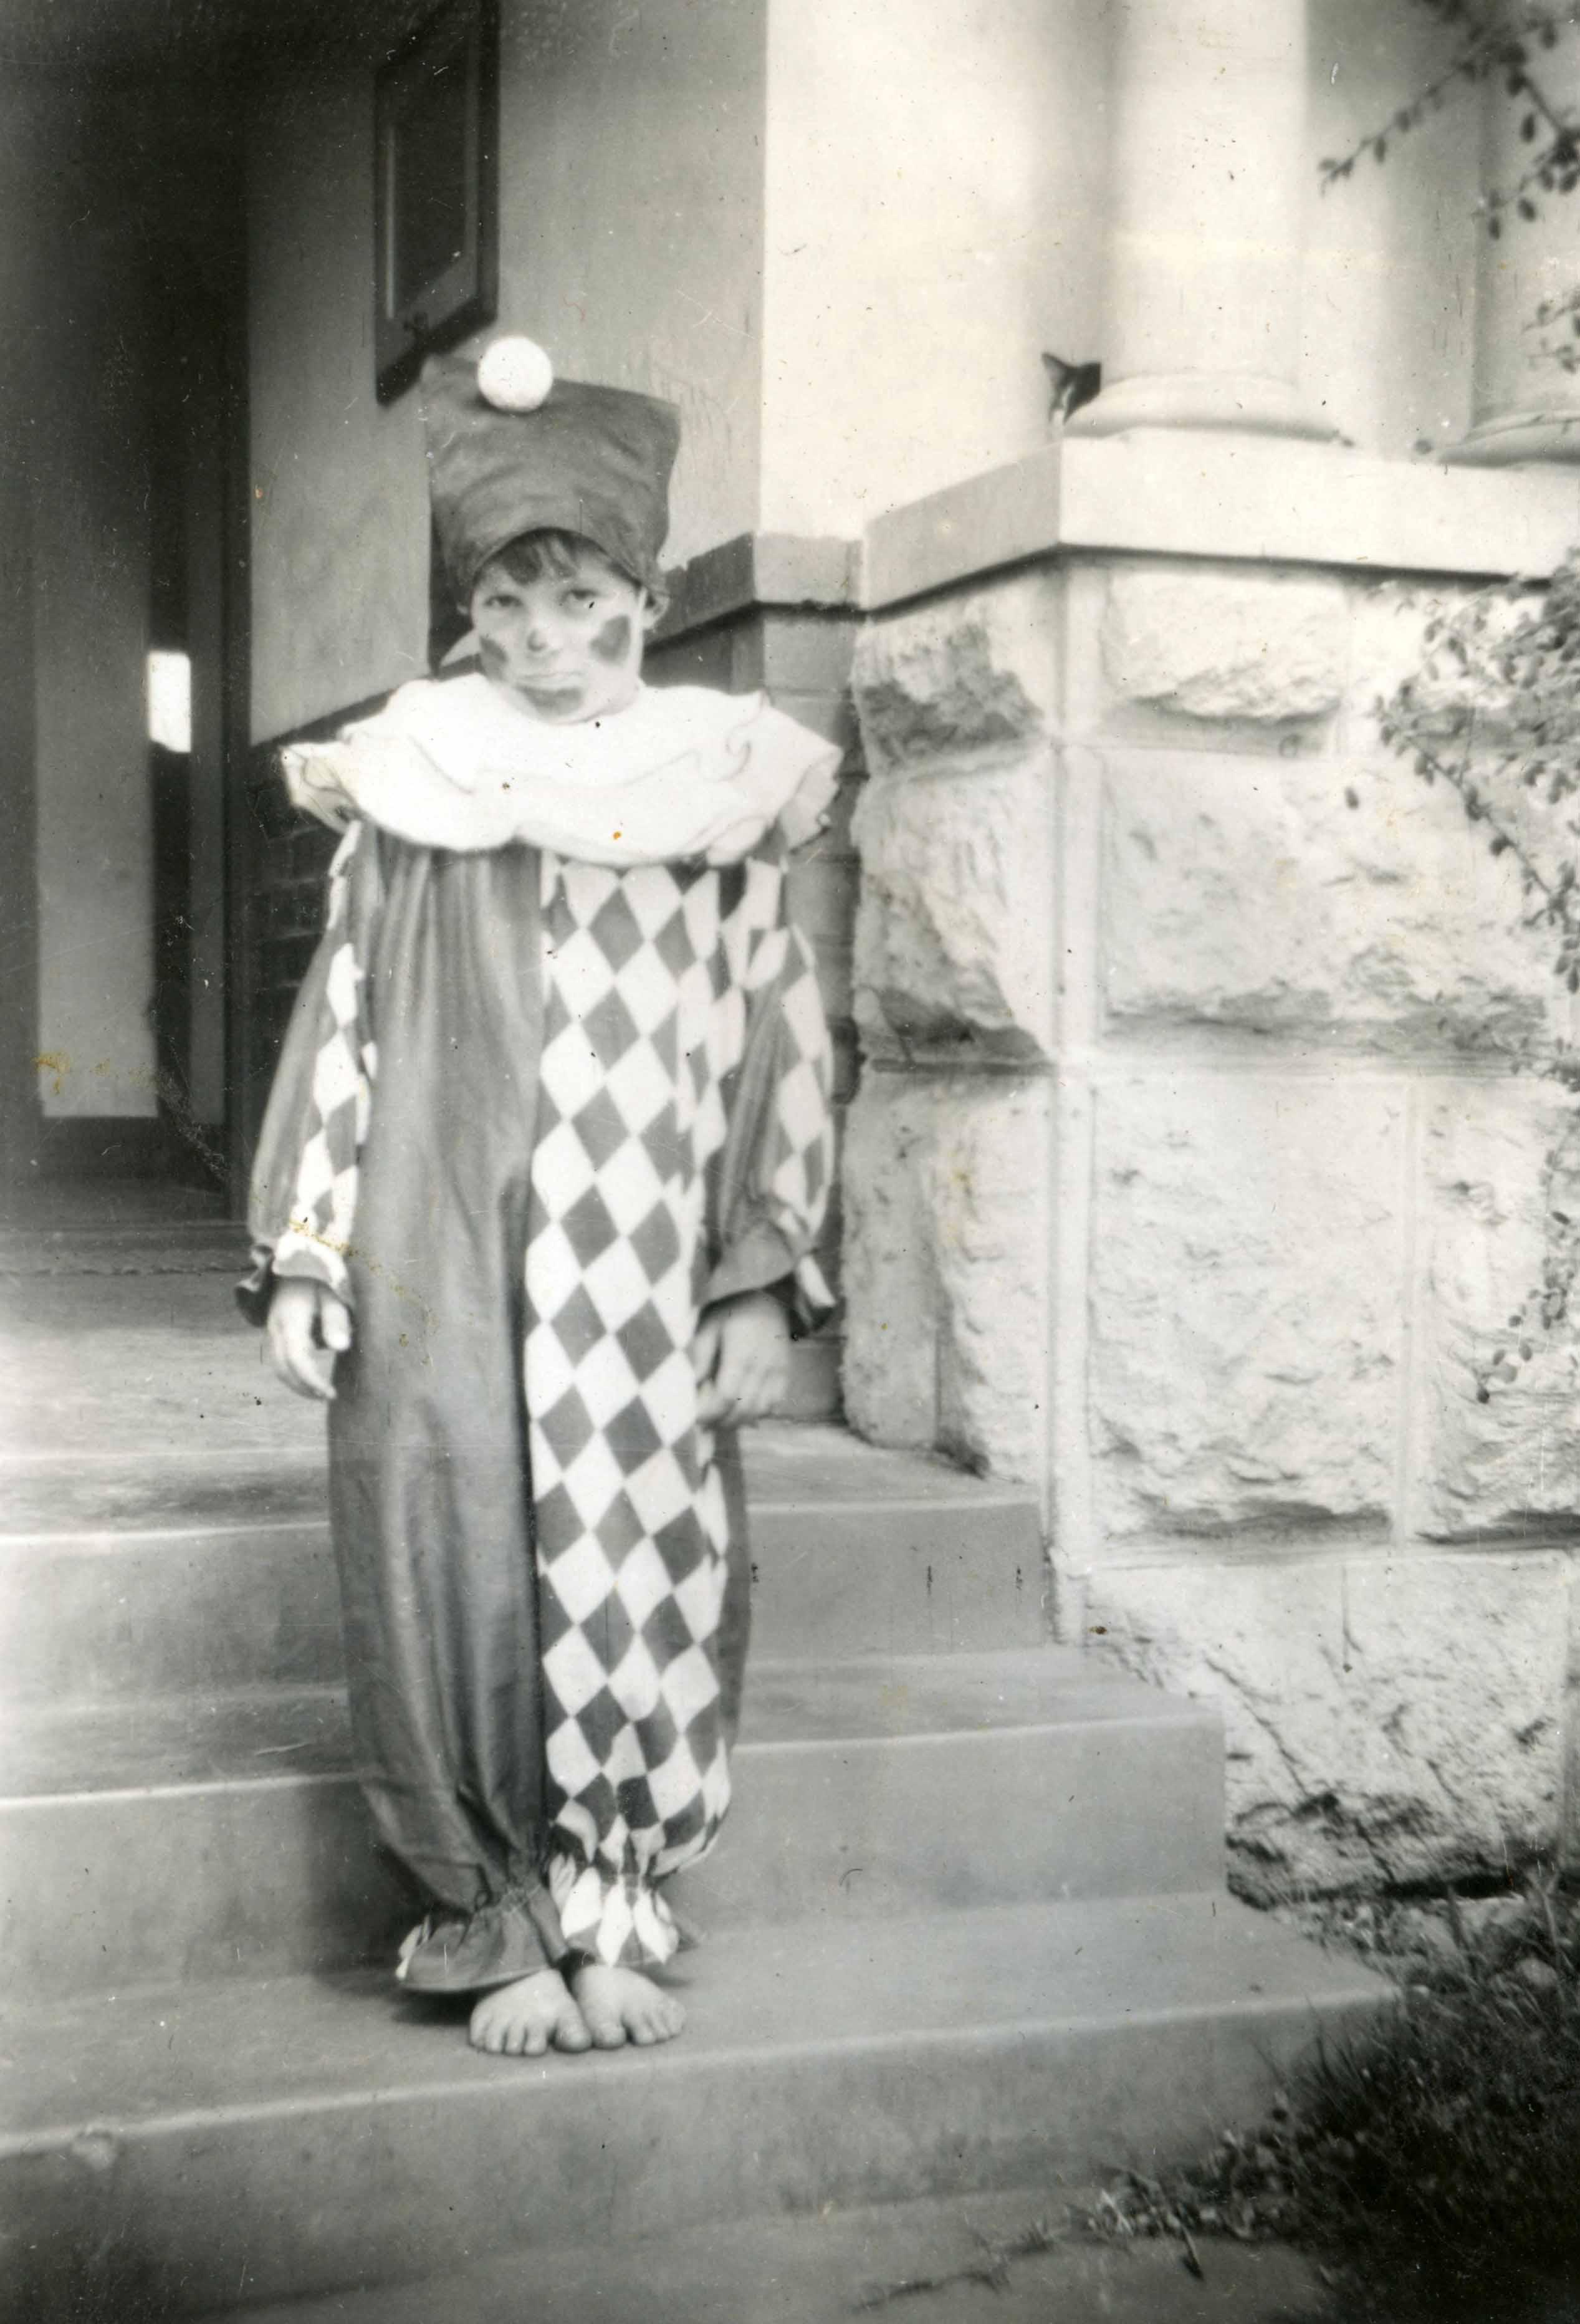 170. Roy Daley, Doris St 1948